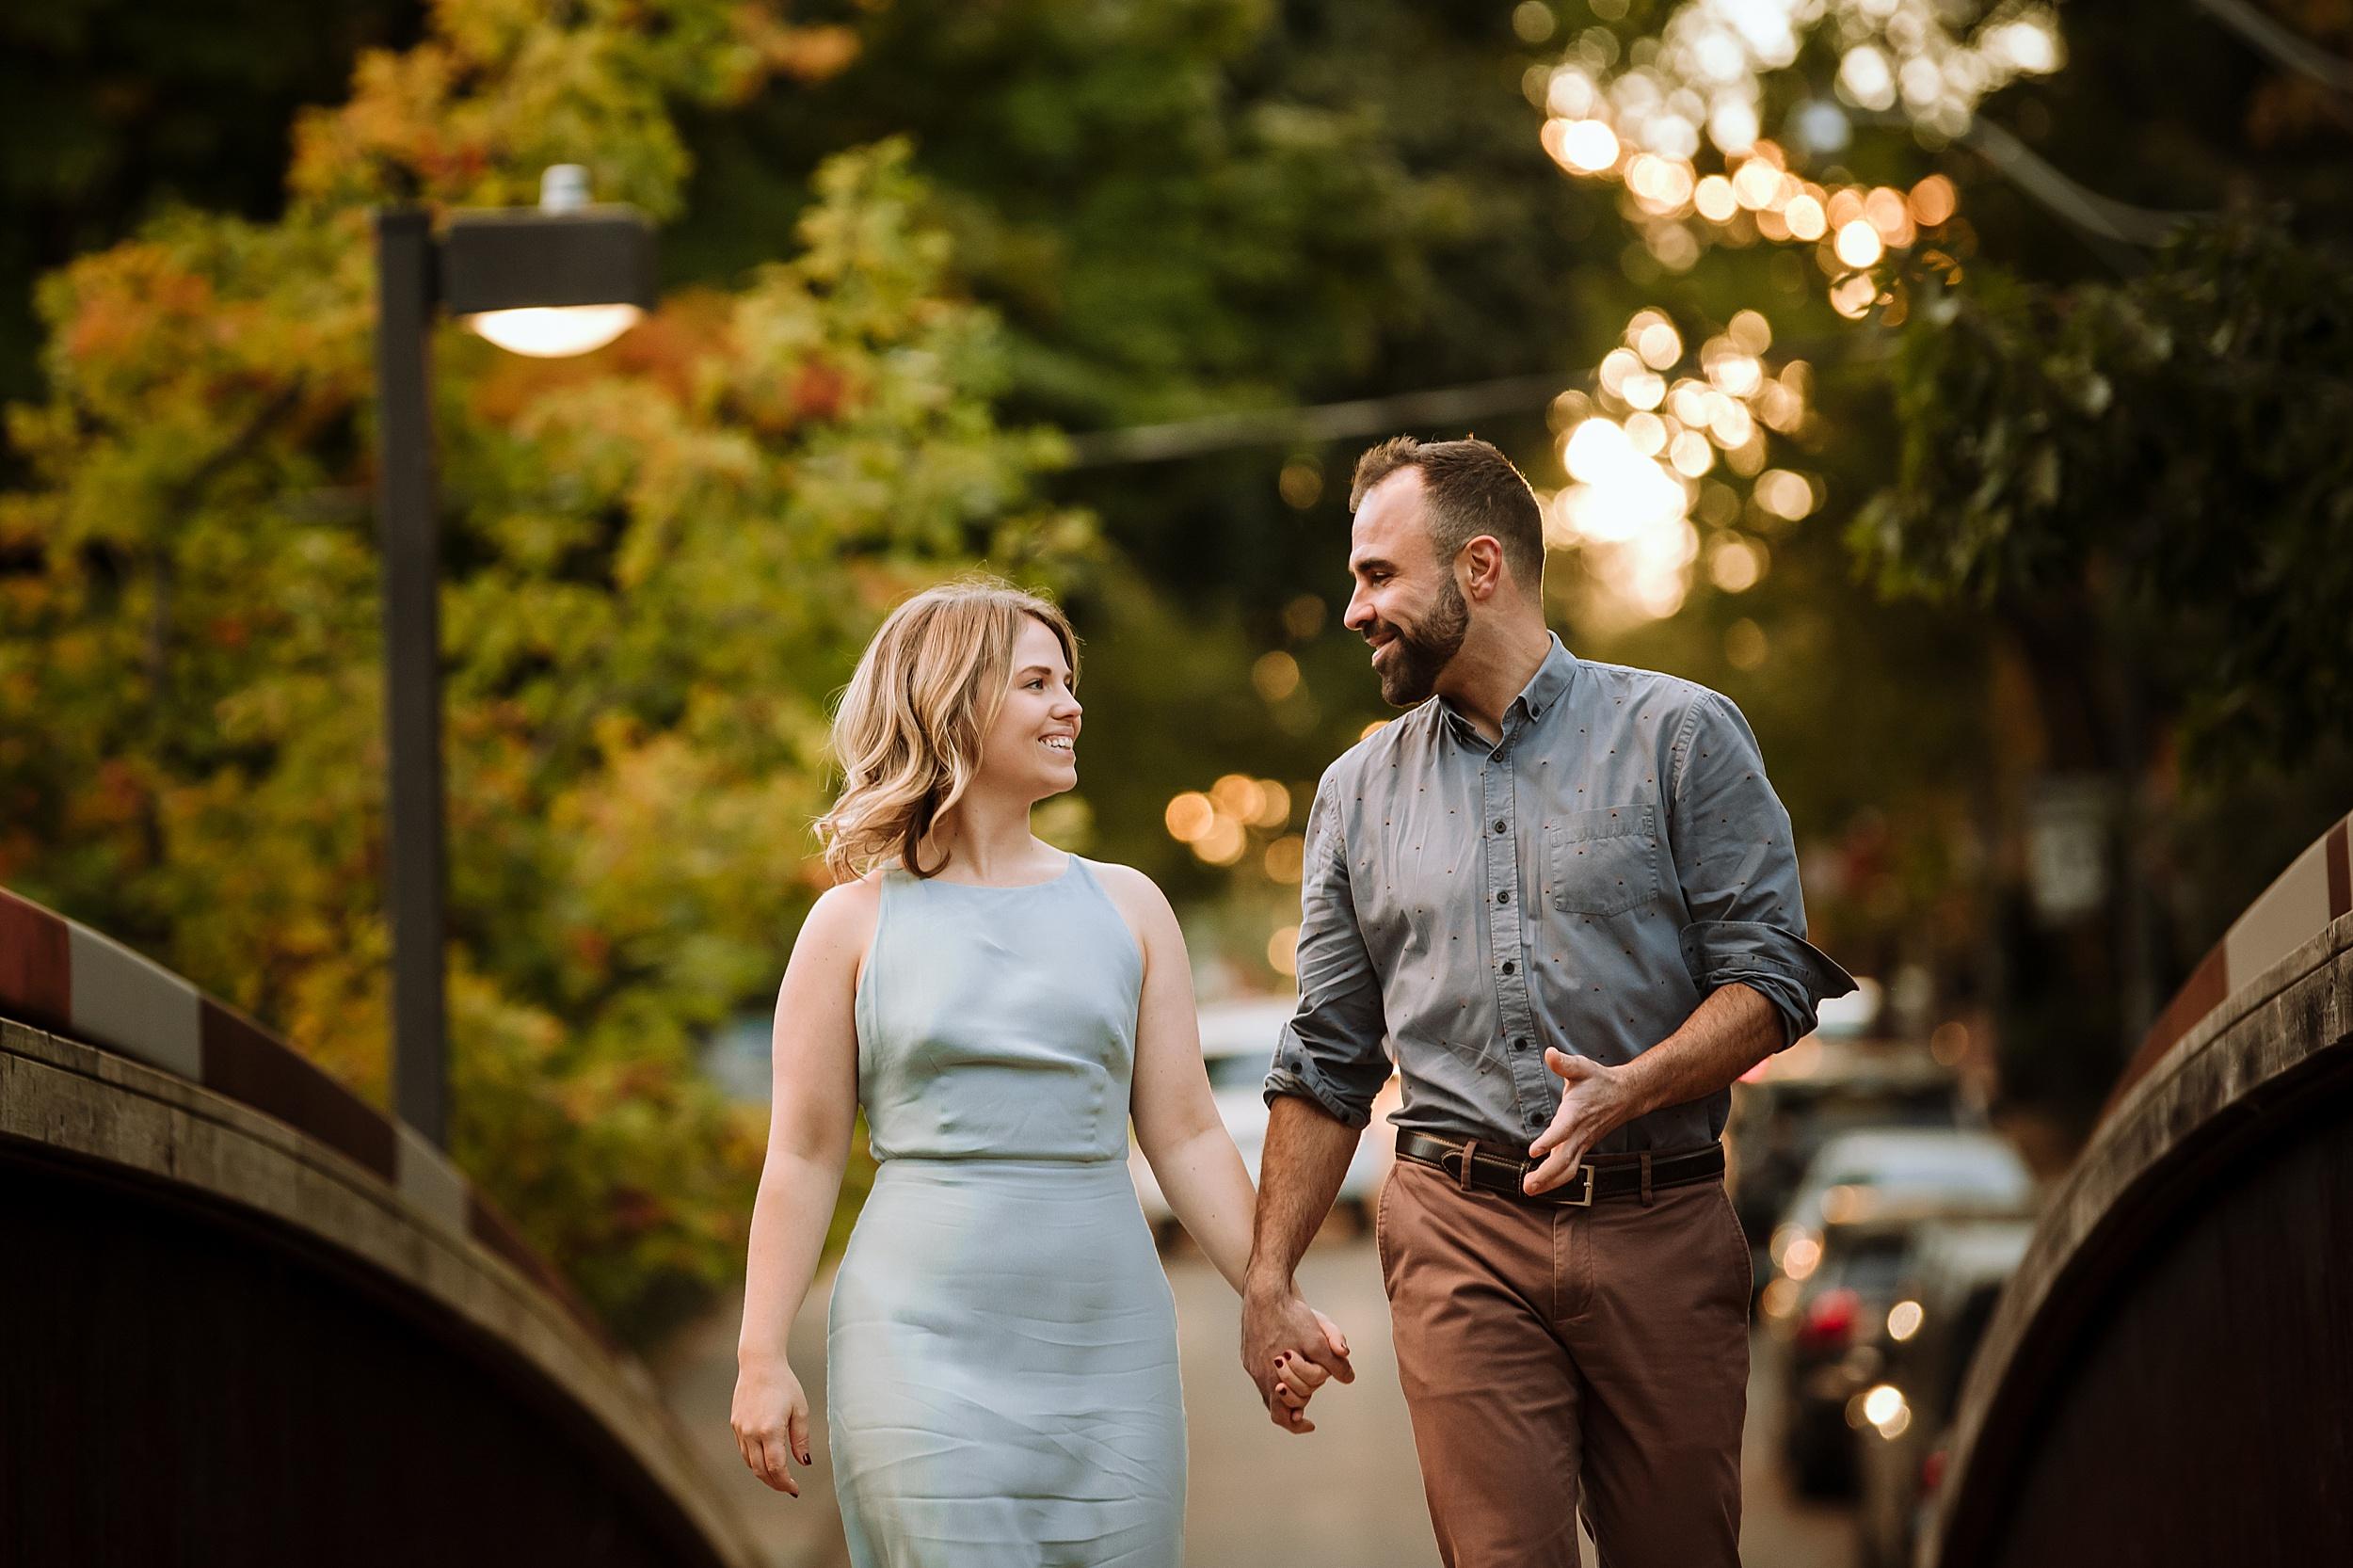 Toronto_Wedding_Photographers_Engagement_Shoot_The_Beaches_009.jpg